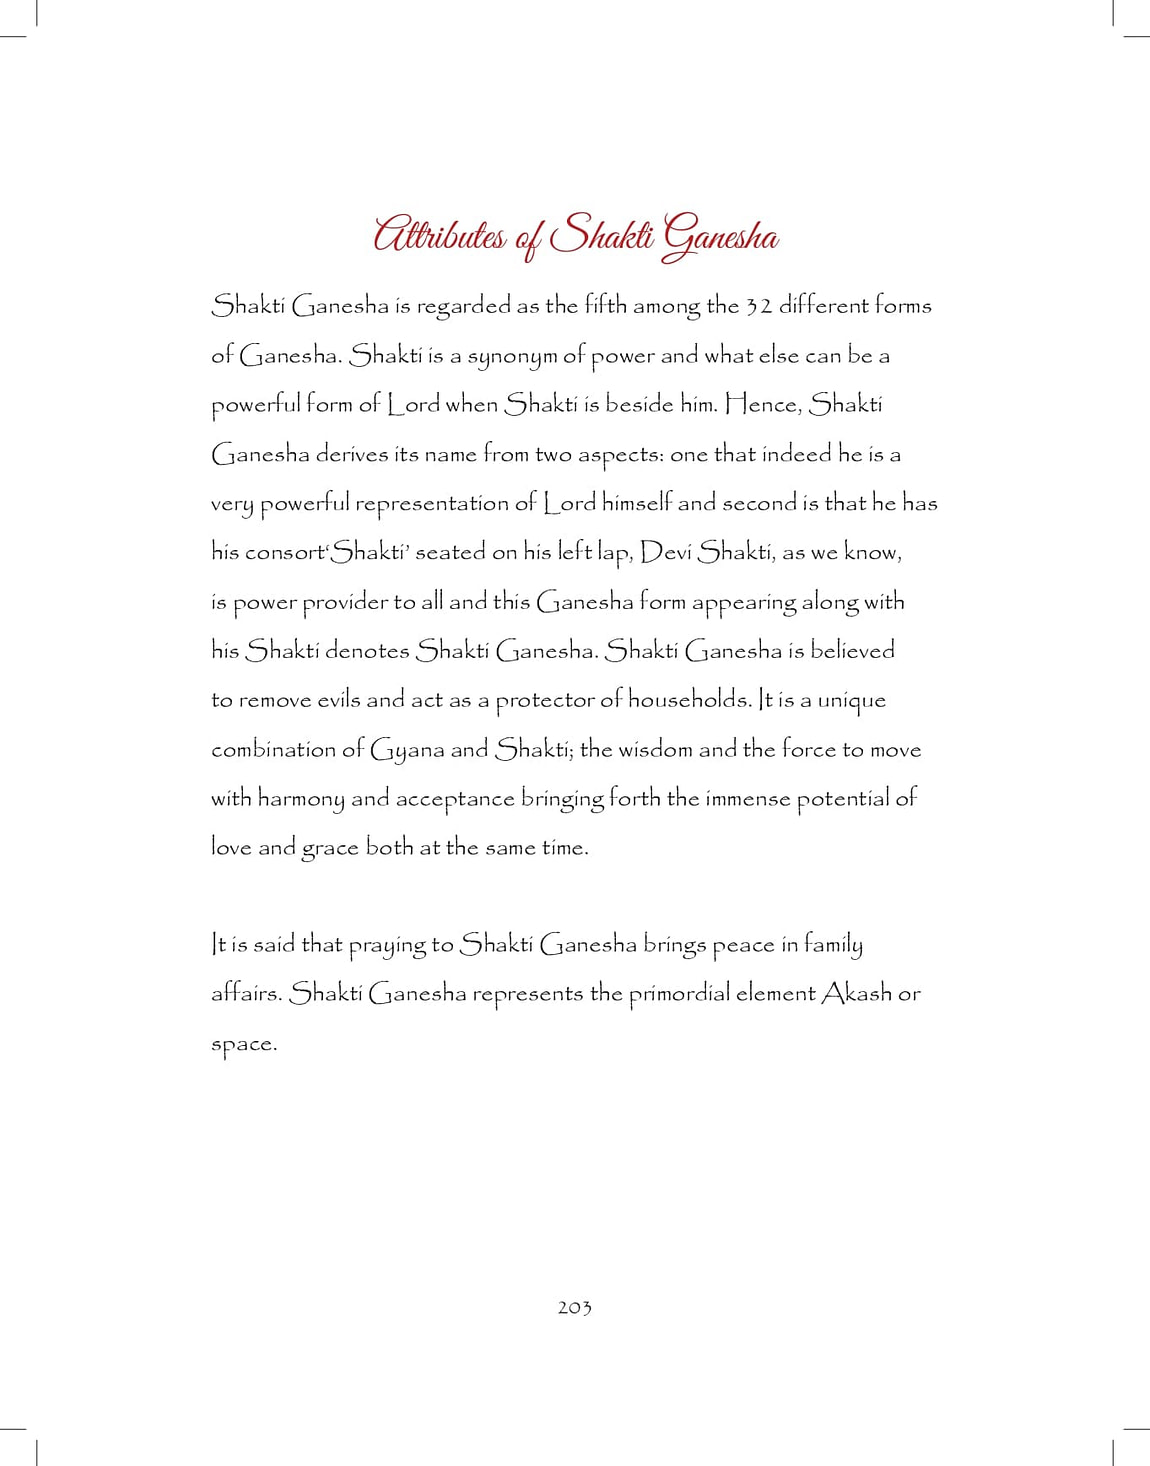 Ganesh-print_pages-to-jpg-0203.jpg